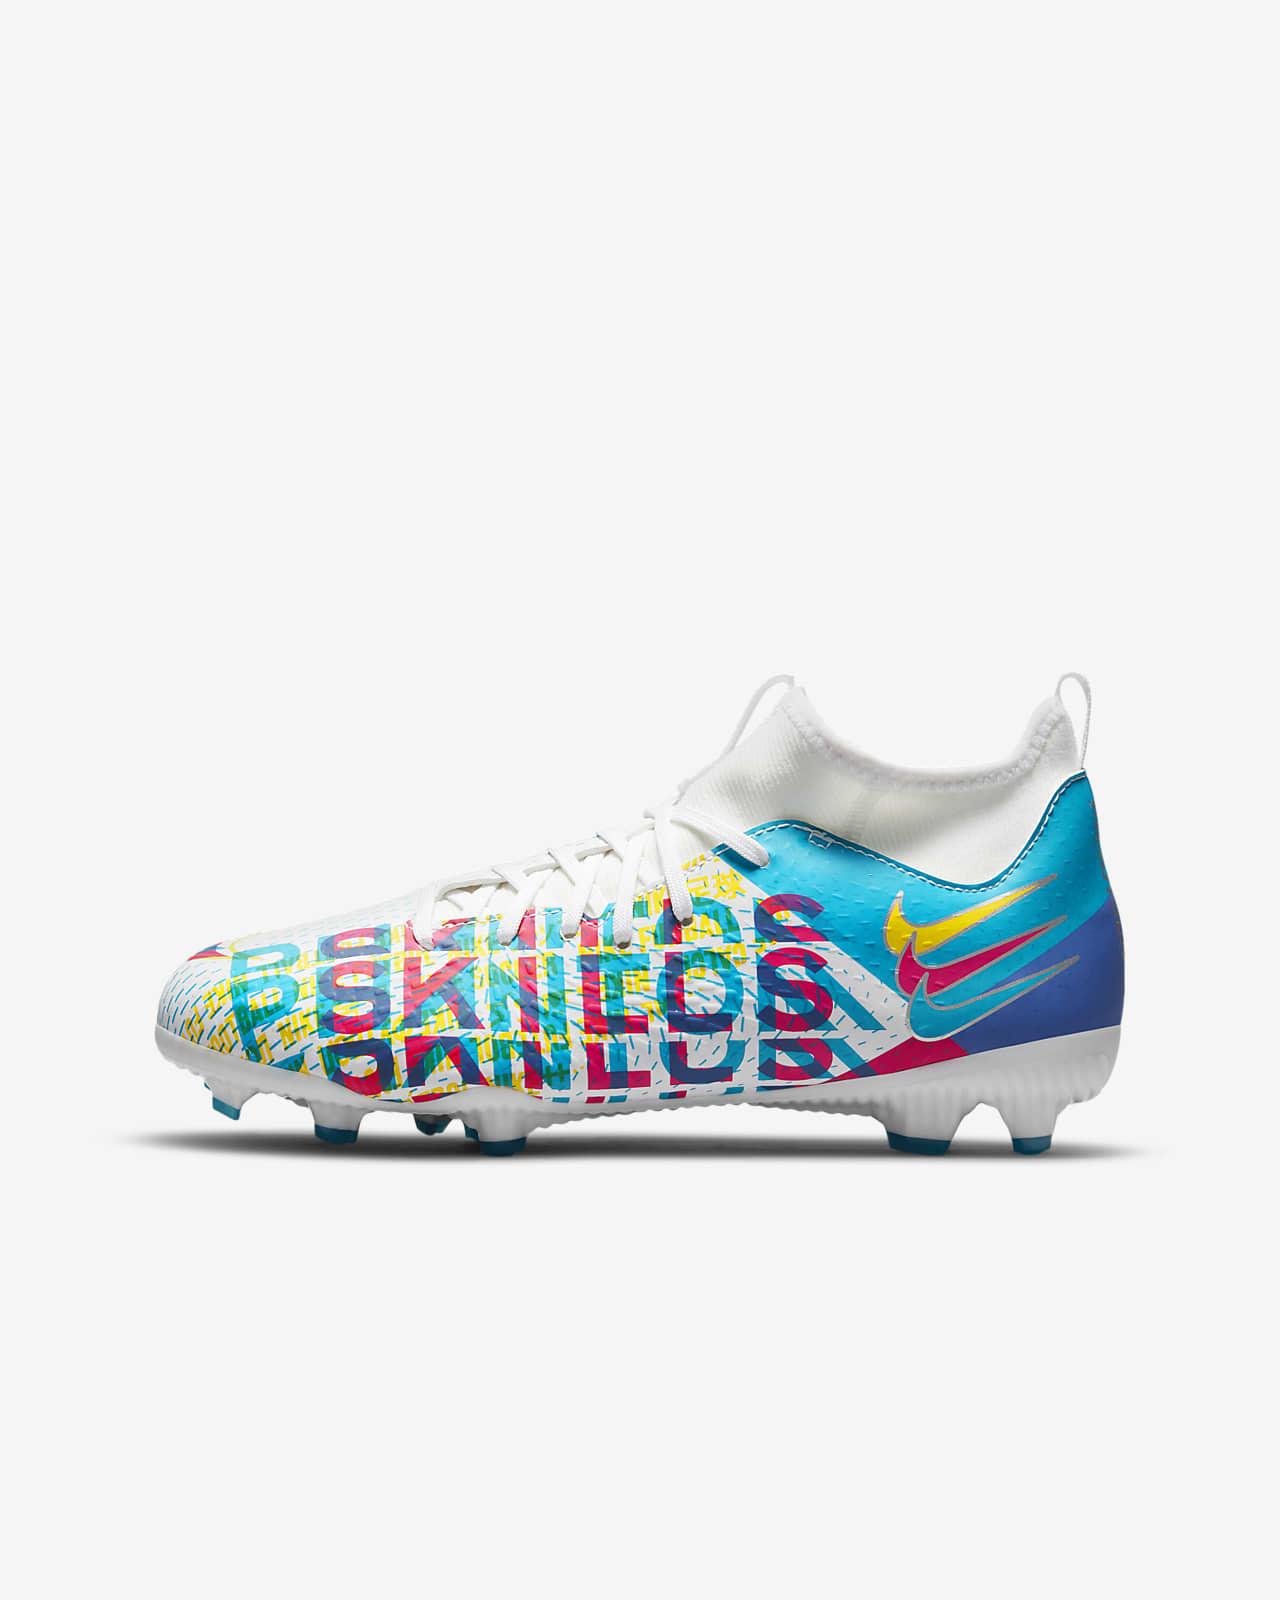 Nike Jr. Phantom GT Academy Dynamic Fit 3D MG Younger/Older Kids' Multi-Ground Football Boot